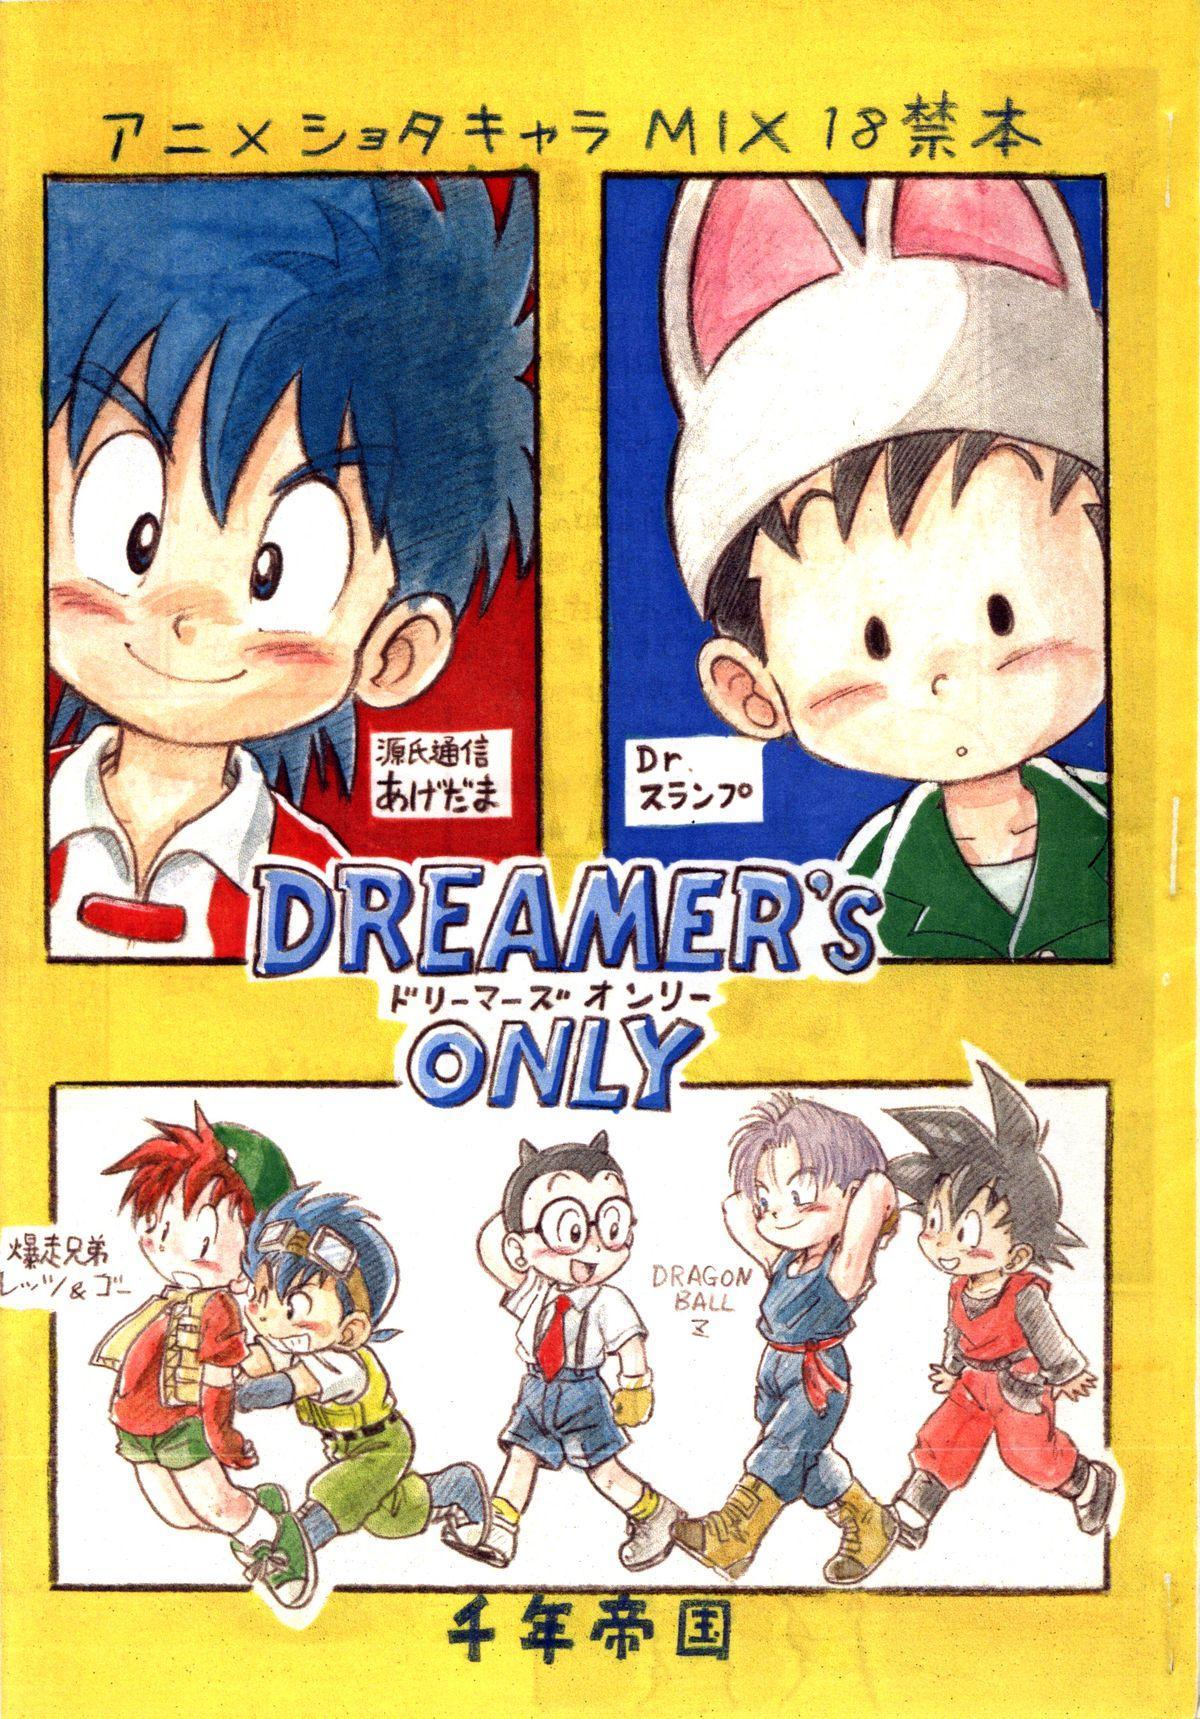 Mitsui Jun - Dreamer's Only - Anime Shota Character Mix 0